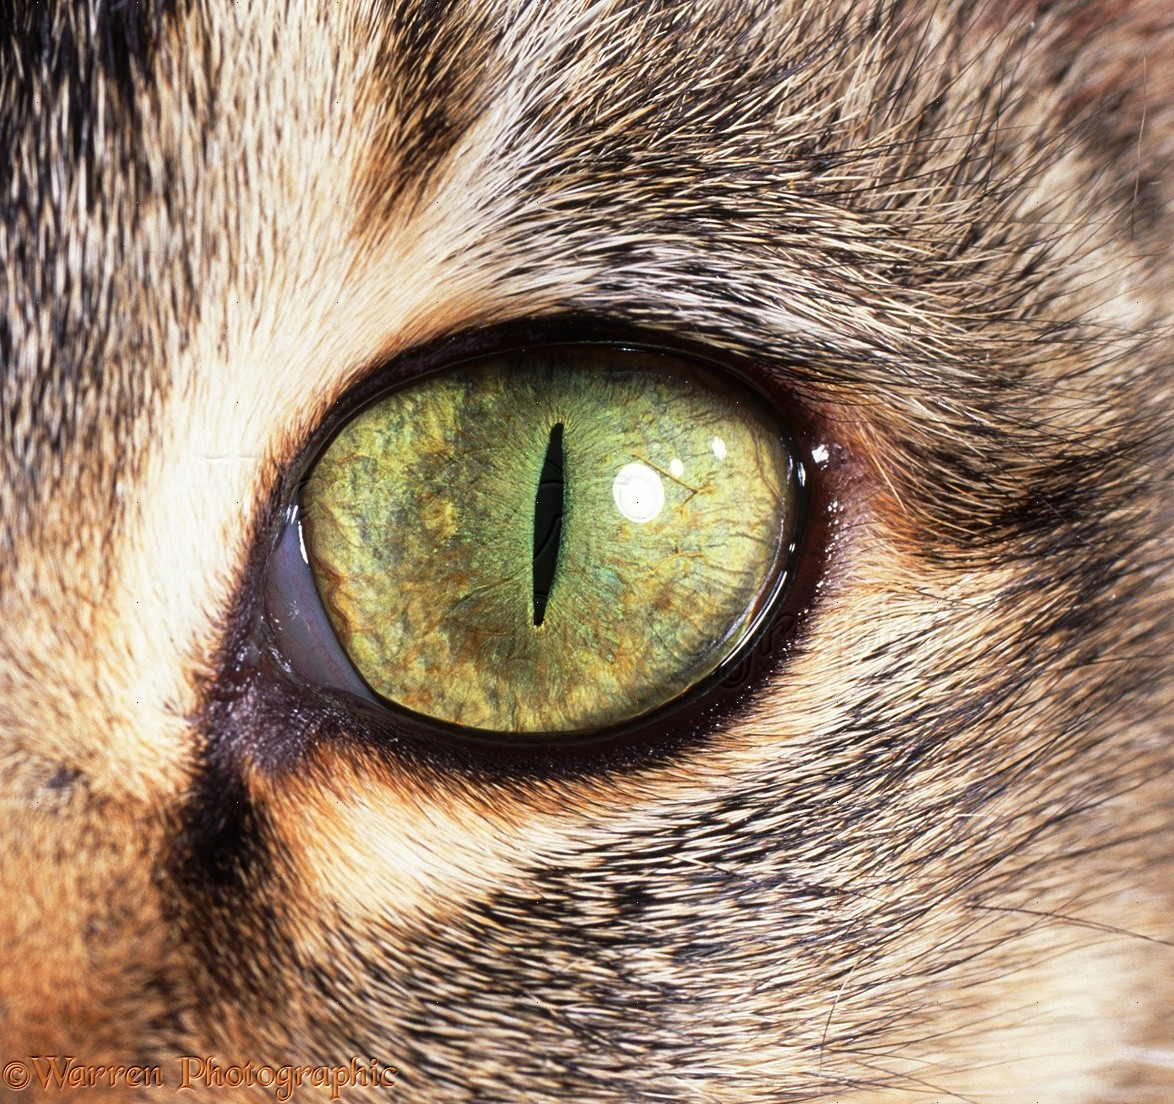 живая картинка глаз кошки текстиль комплекте